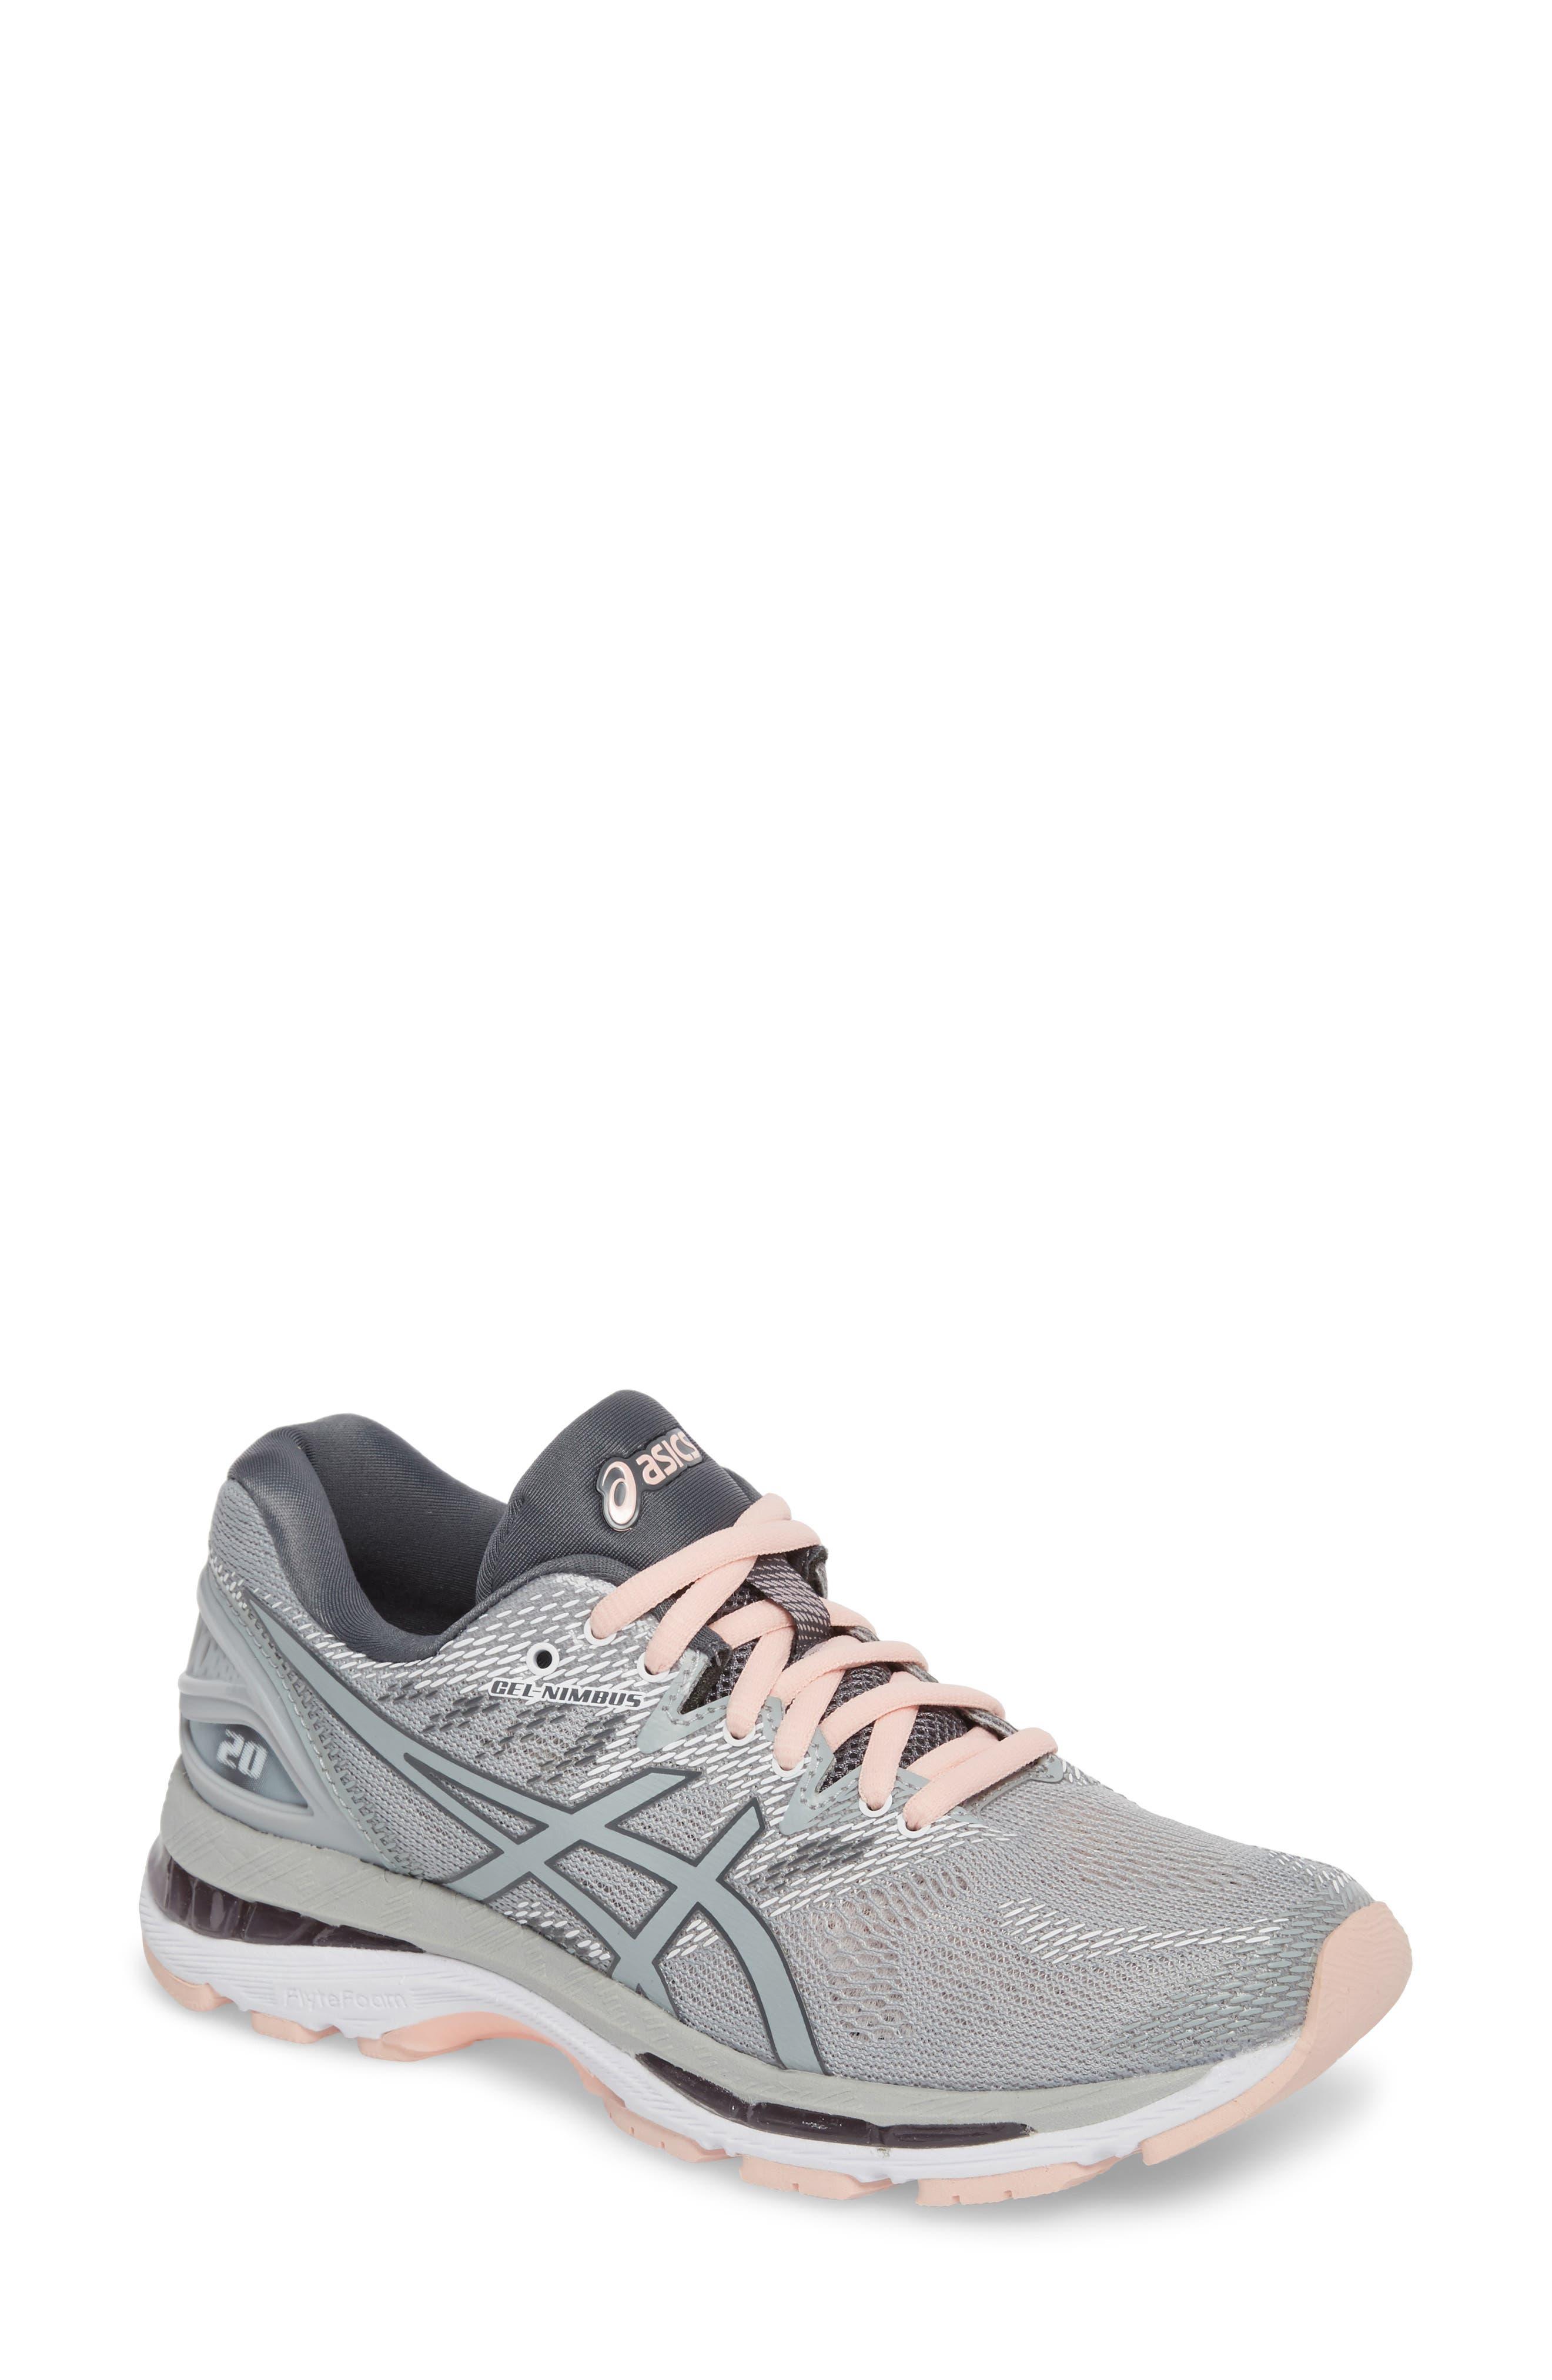 Alternate Image 1 Selected - ASICS® GEL®-Nimbus 20 Running Shoe (Women)